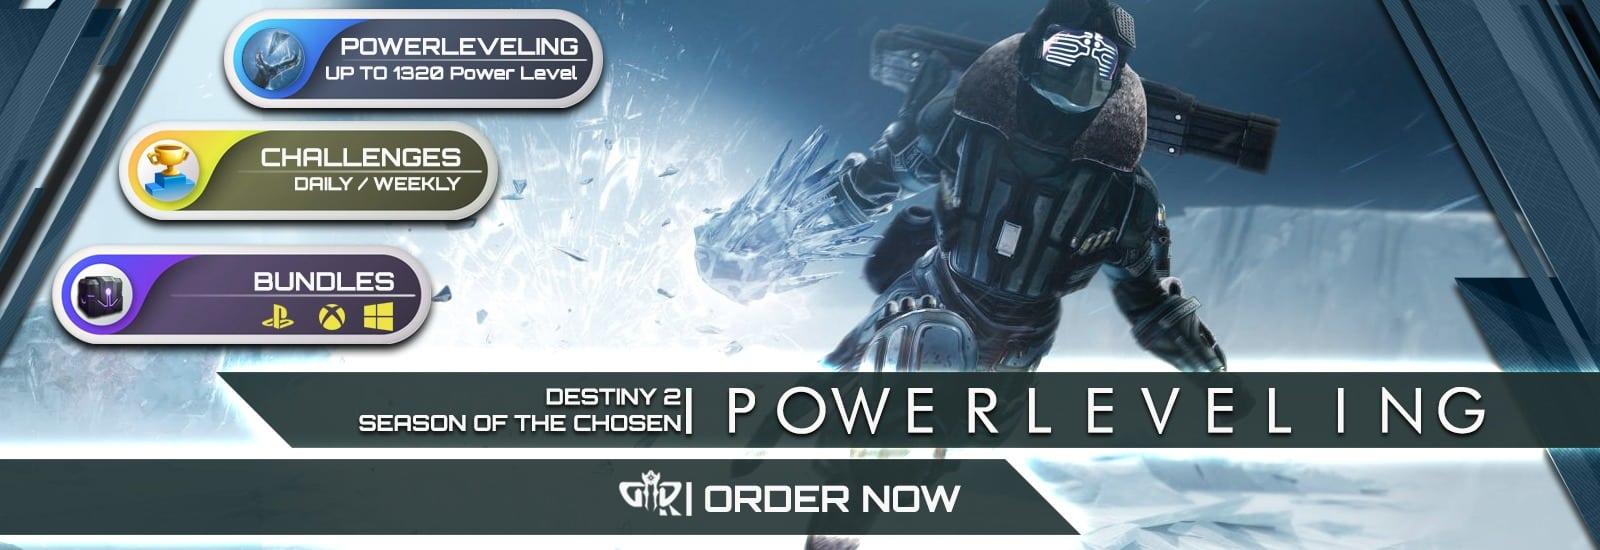 Destiny 2 Boosting - Power leveling 1320 PL Boost